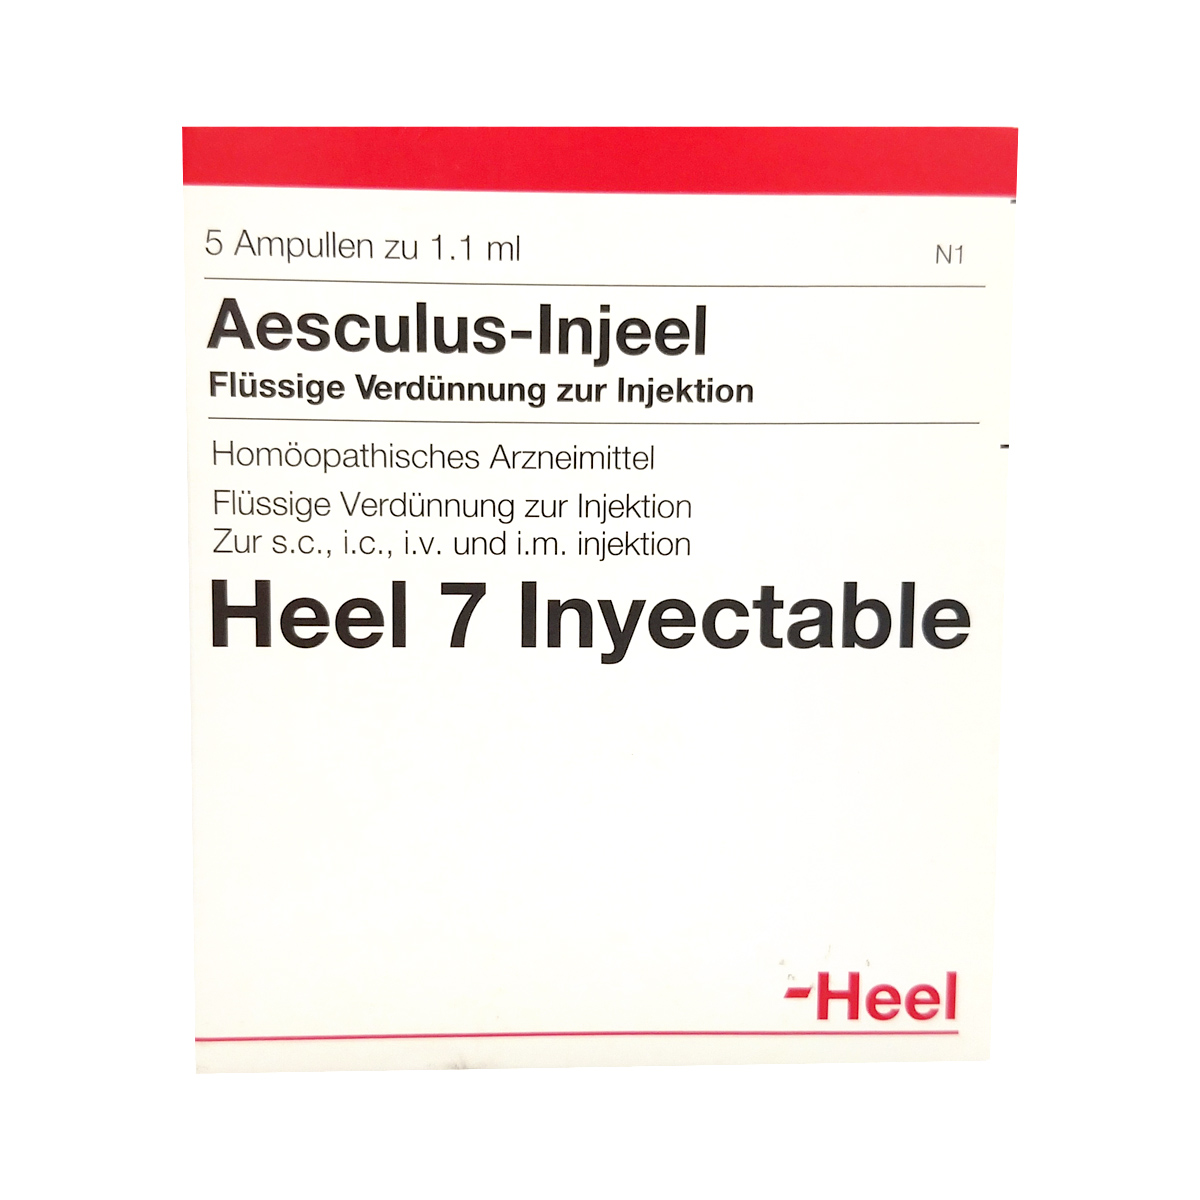 Medicamento homopatico para venas